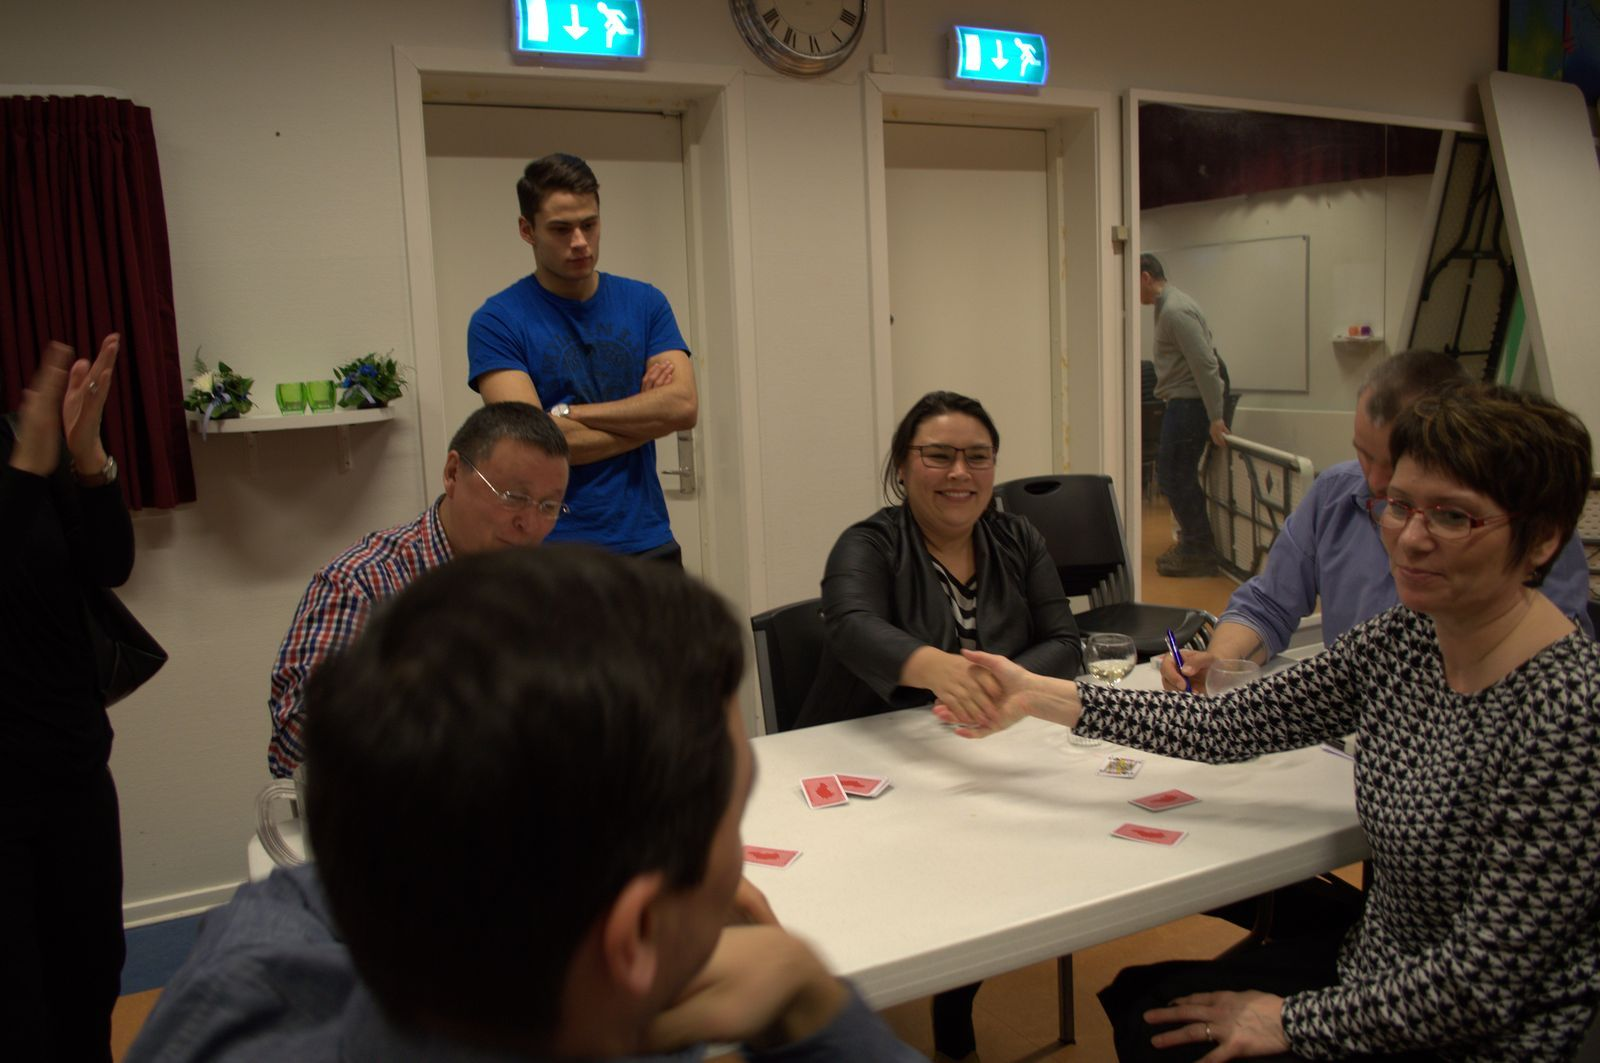 2015-03-08-0020_Semifinalen_spilles_Worms_4